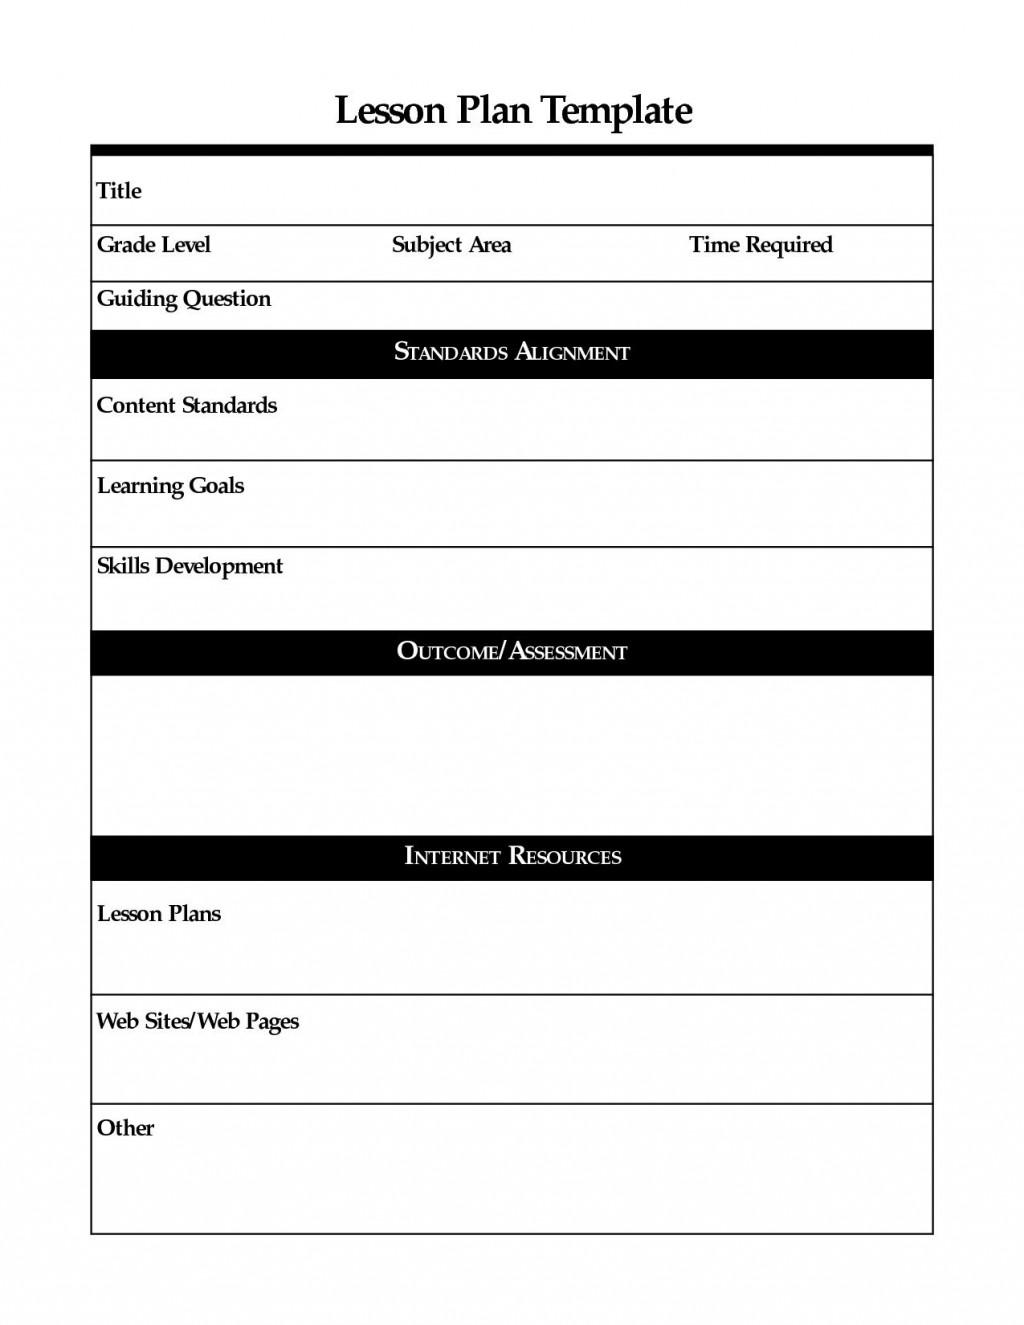 001 Wondrou Free Printable Lesson Plan Template Inspiration  Preschool Weekly For KindergartenLarge